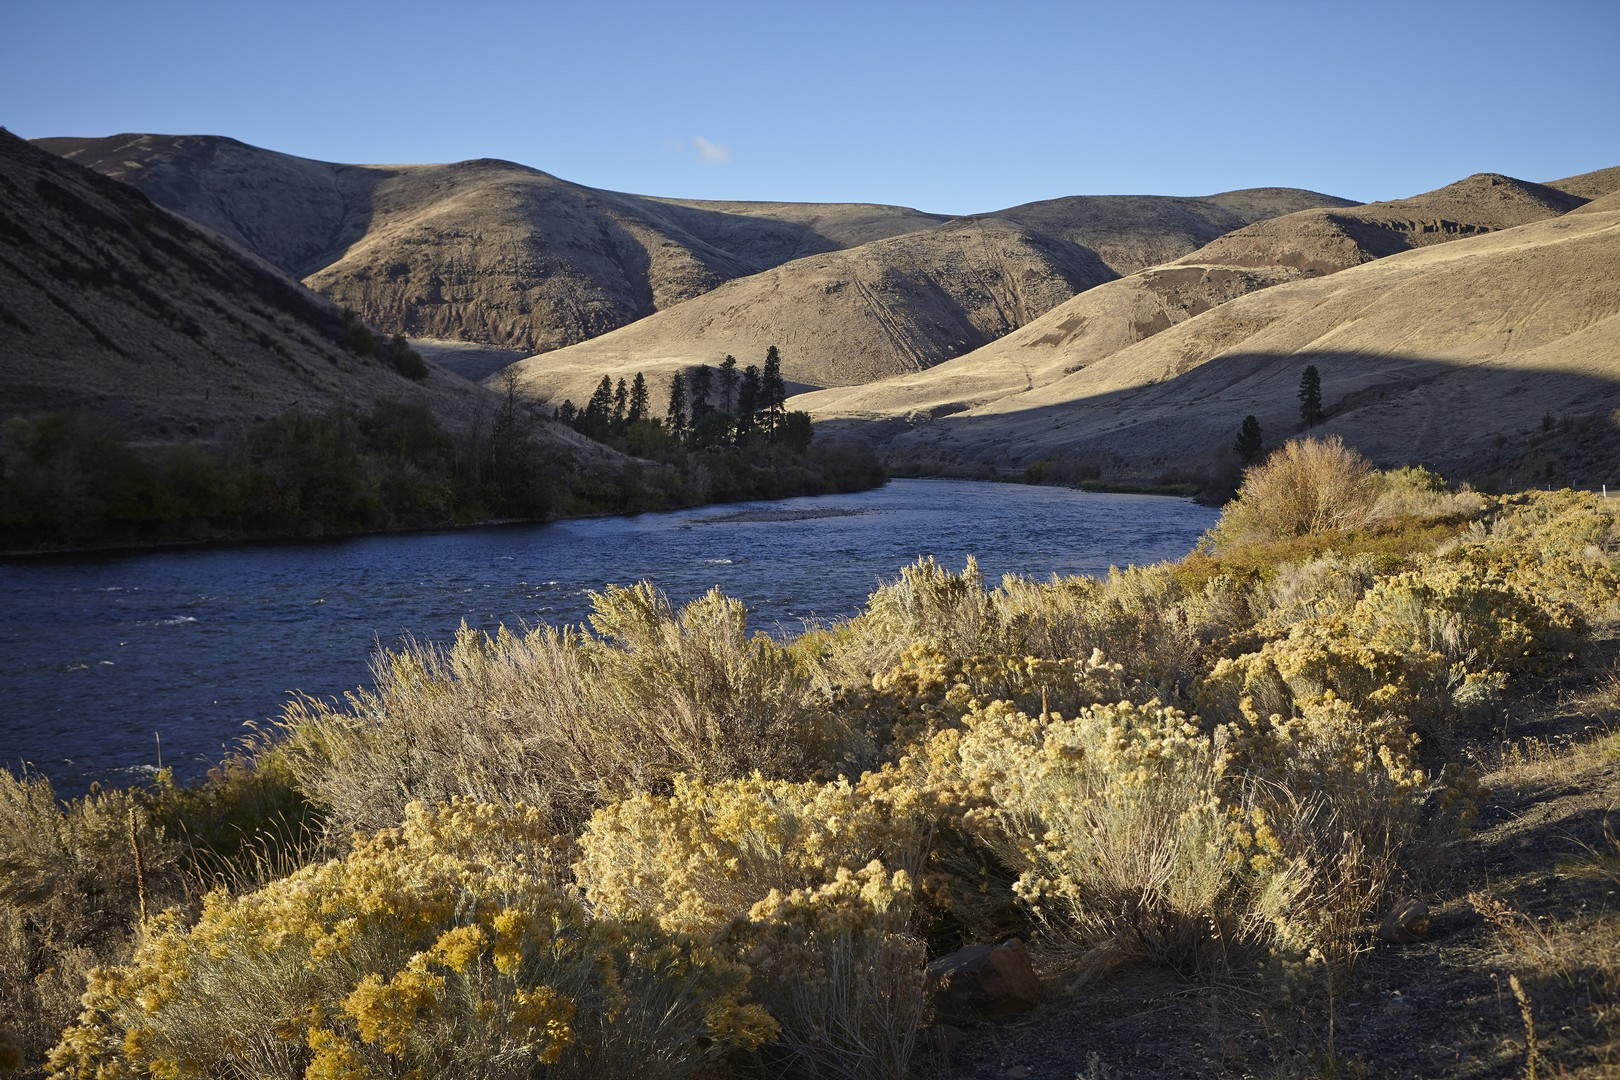 Terreno per Vendita alle ore Canyon River Ranch - Lot 12 140704 SR 821 #12 Ellensburg, Washington, 98926 Stati Uniti